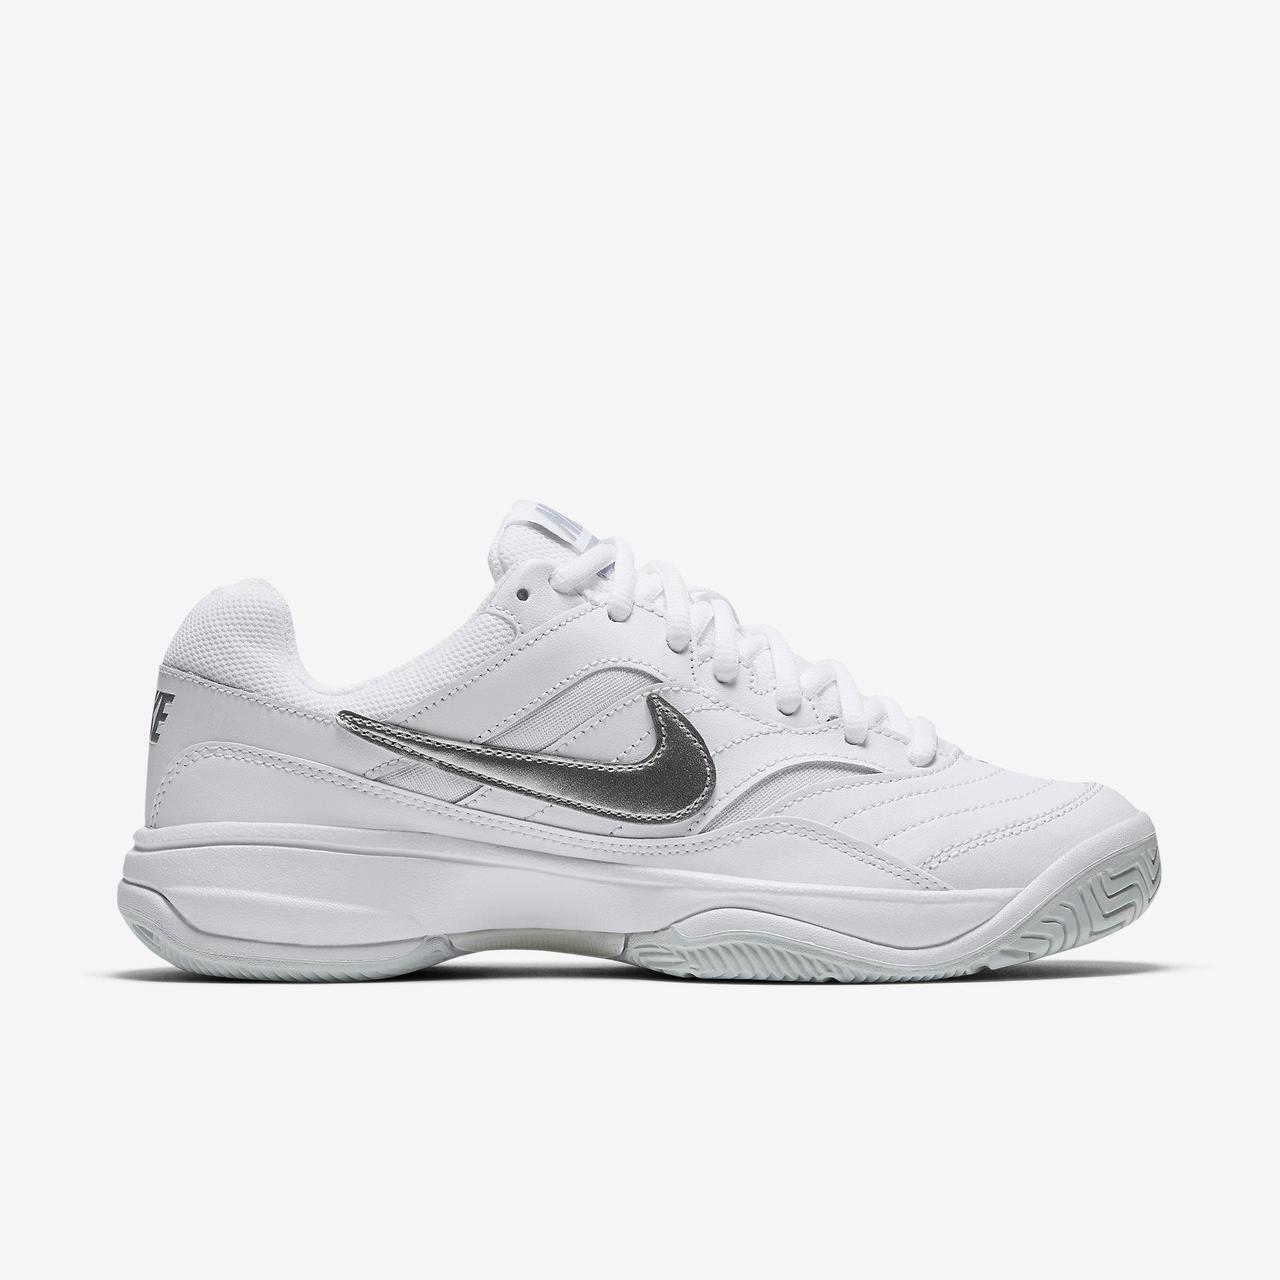 a7e1aa7f307c Женские теннисные кроссовки Nike Court Lite (845048-100)  продажа ...